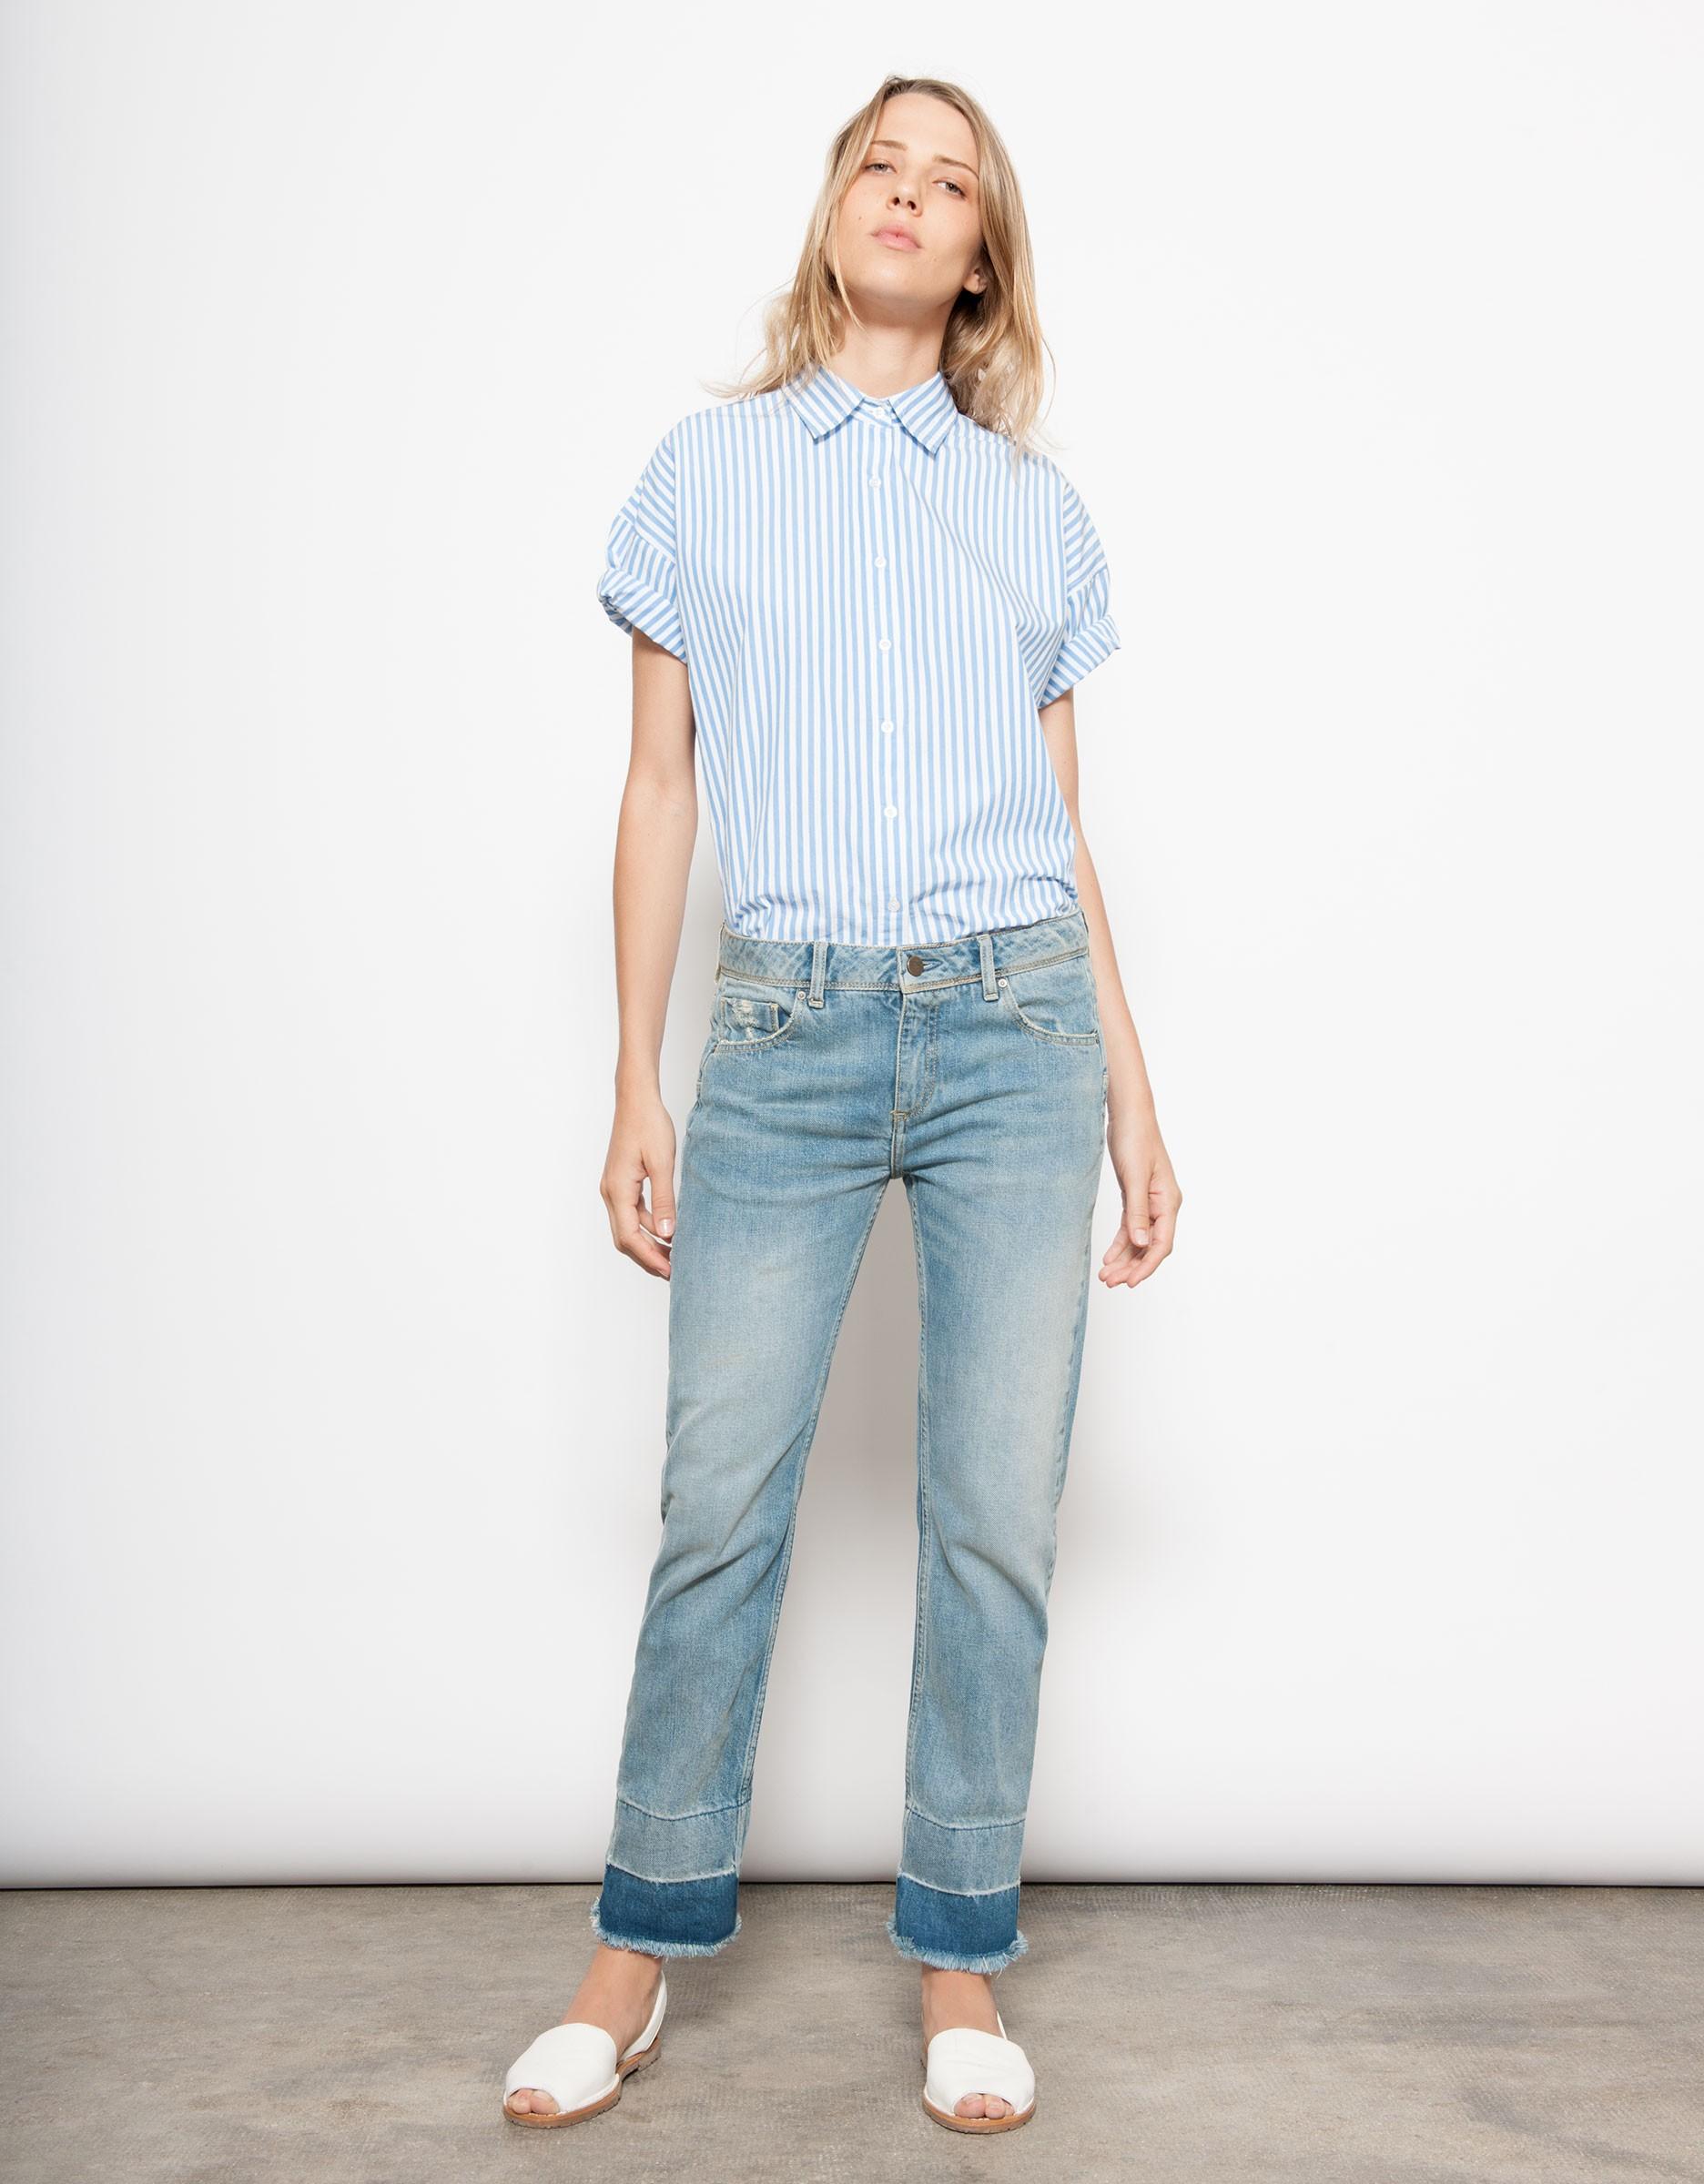 jean boyfriend nina denim m 34 reiko jeans. Black Bedroom Furniture Sets. Home Design Ideas